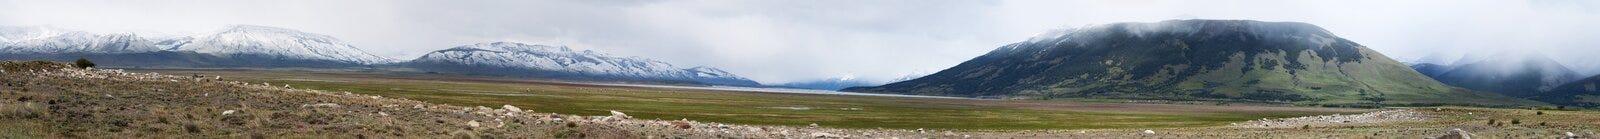 Gr Calafate, Gletsjers Nationaal Park, Patagonië, Argentinië, Zuid-Amerika Royalty-vrije Stock Afbeeldingen